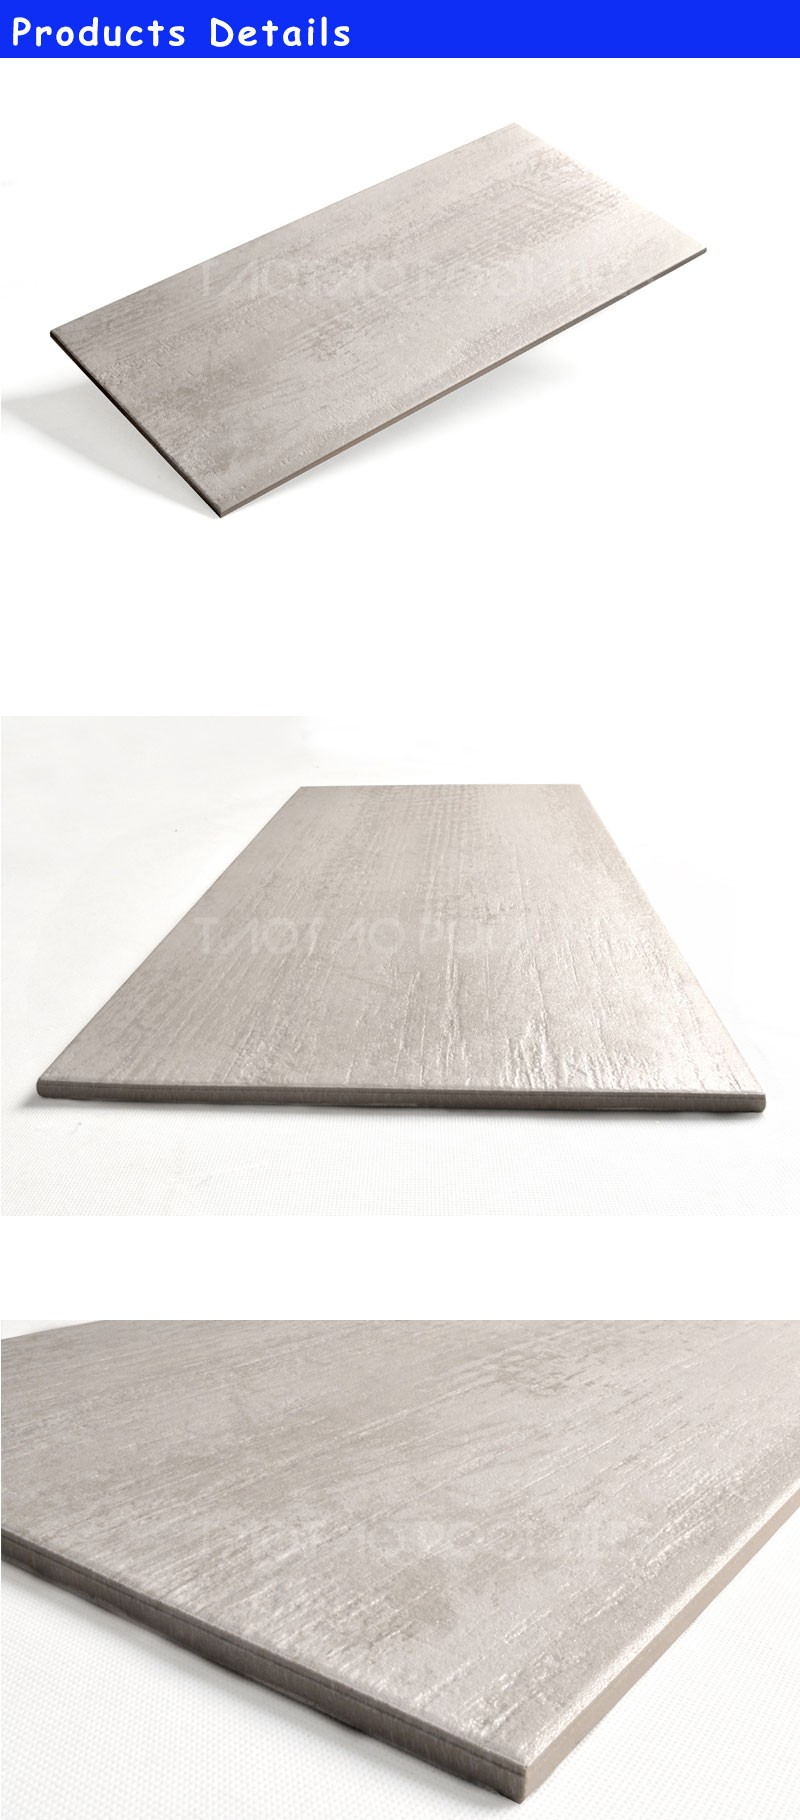 Flooring tiles rates